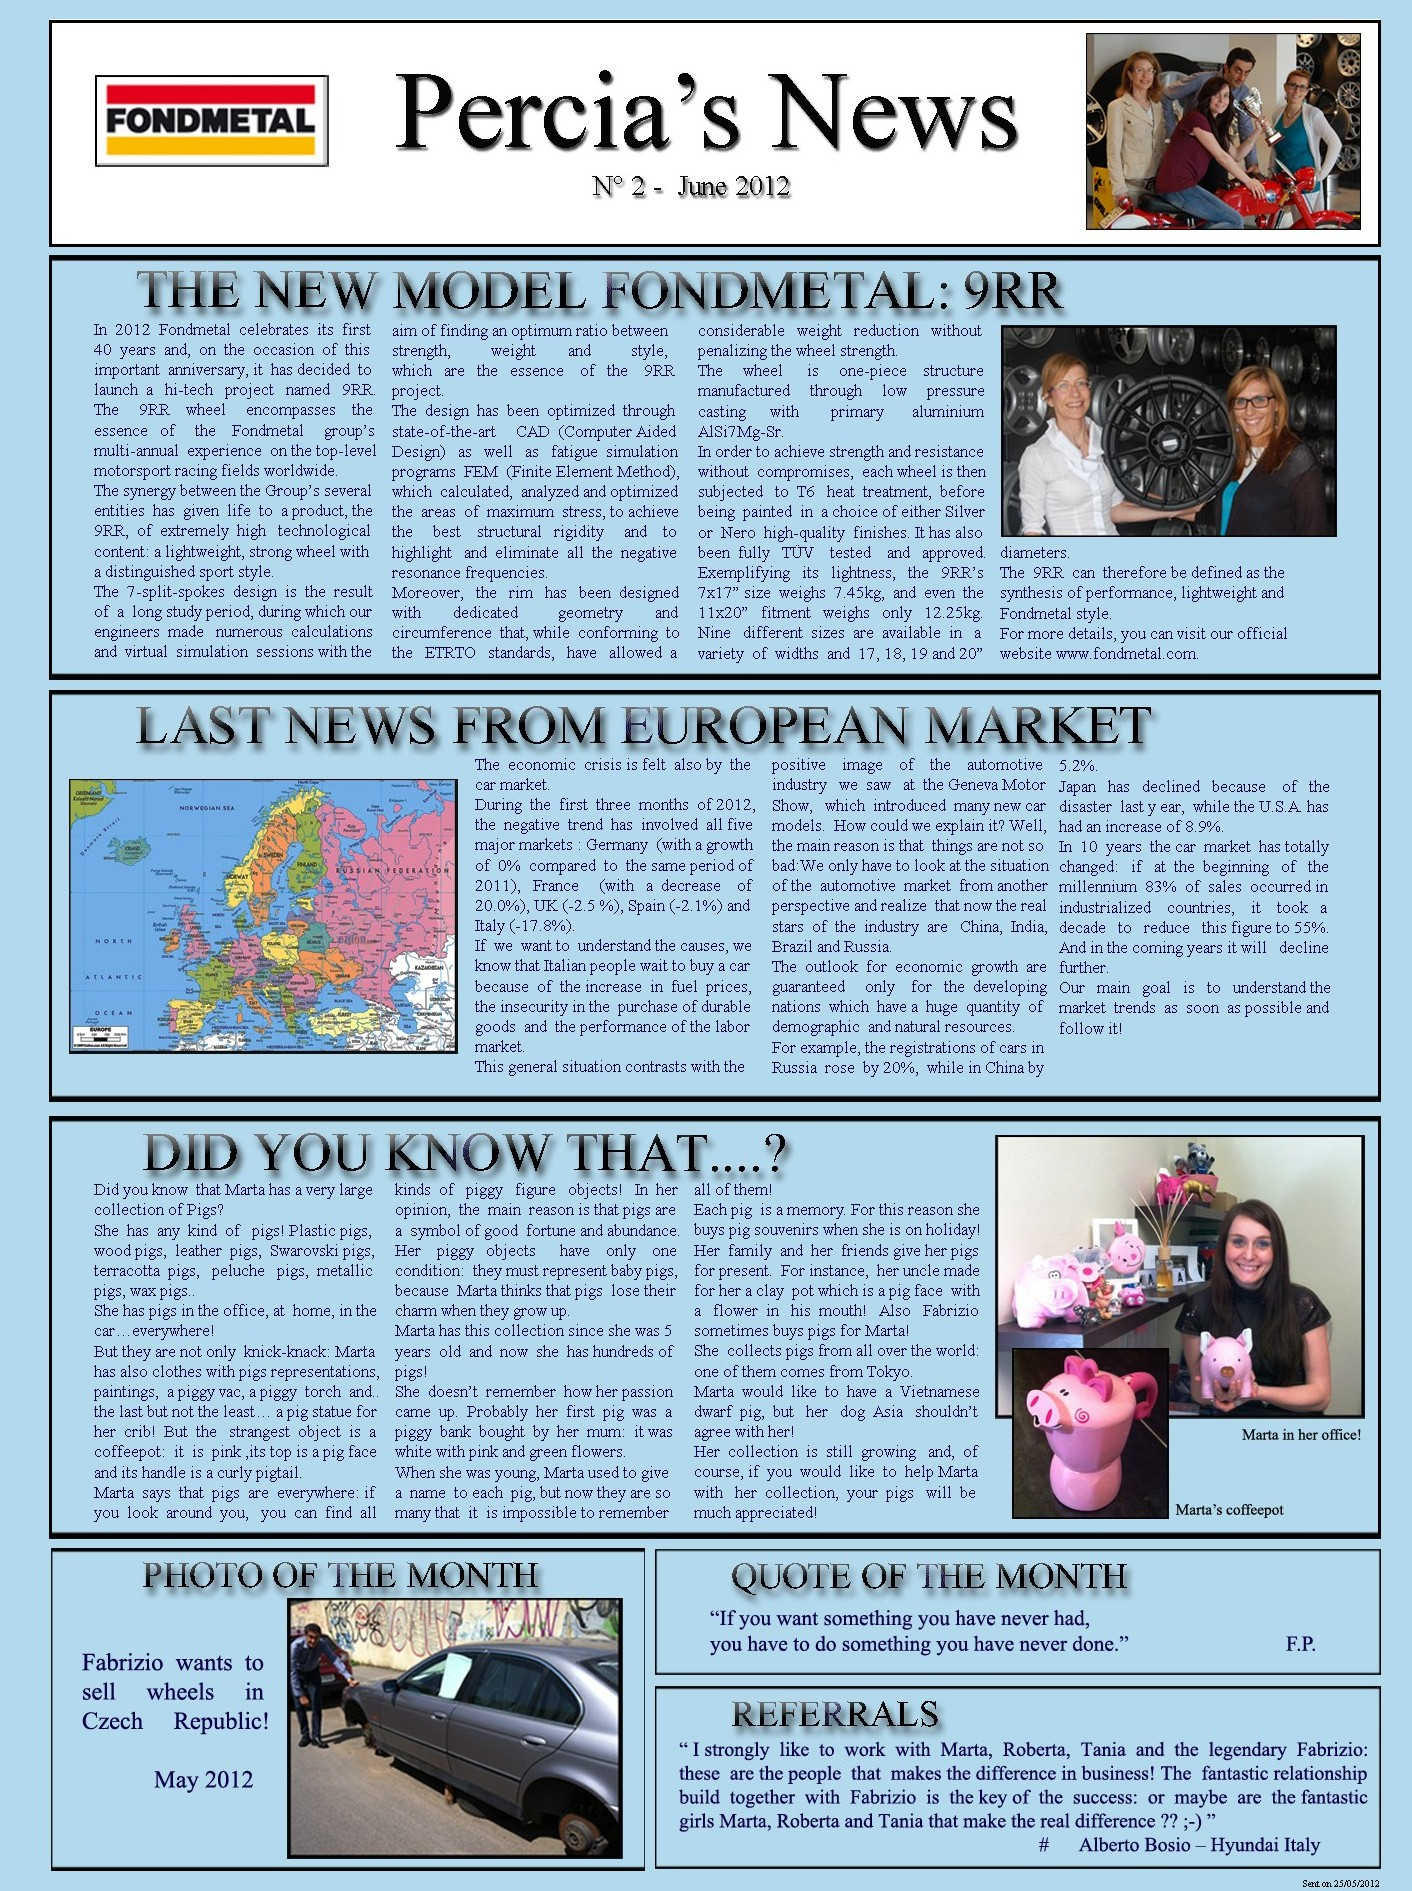 PERCIA'S NEWS JUNE 2012